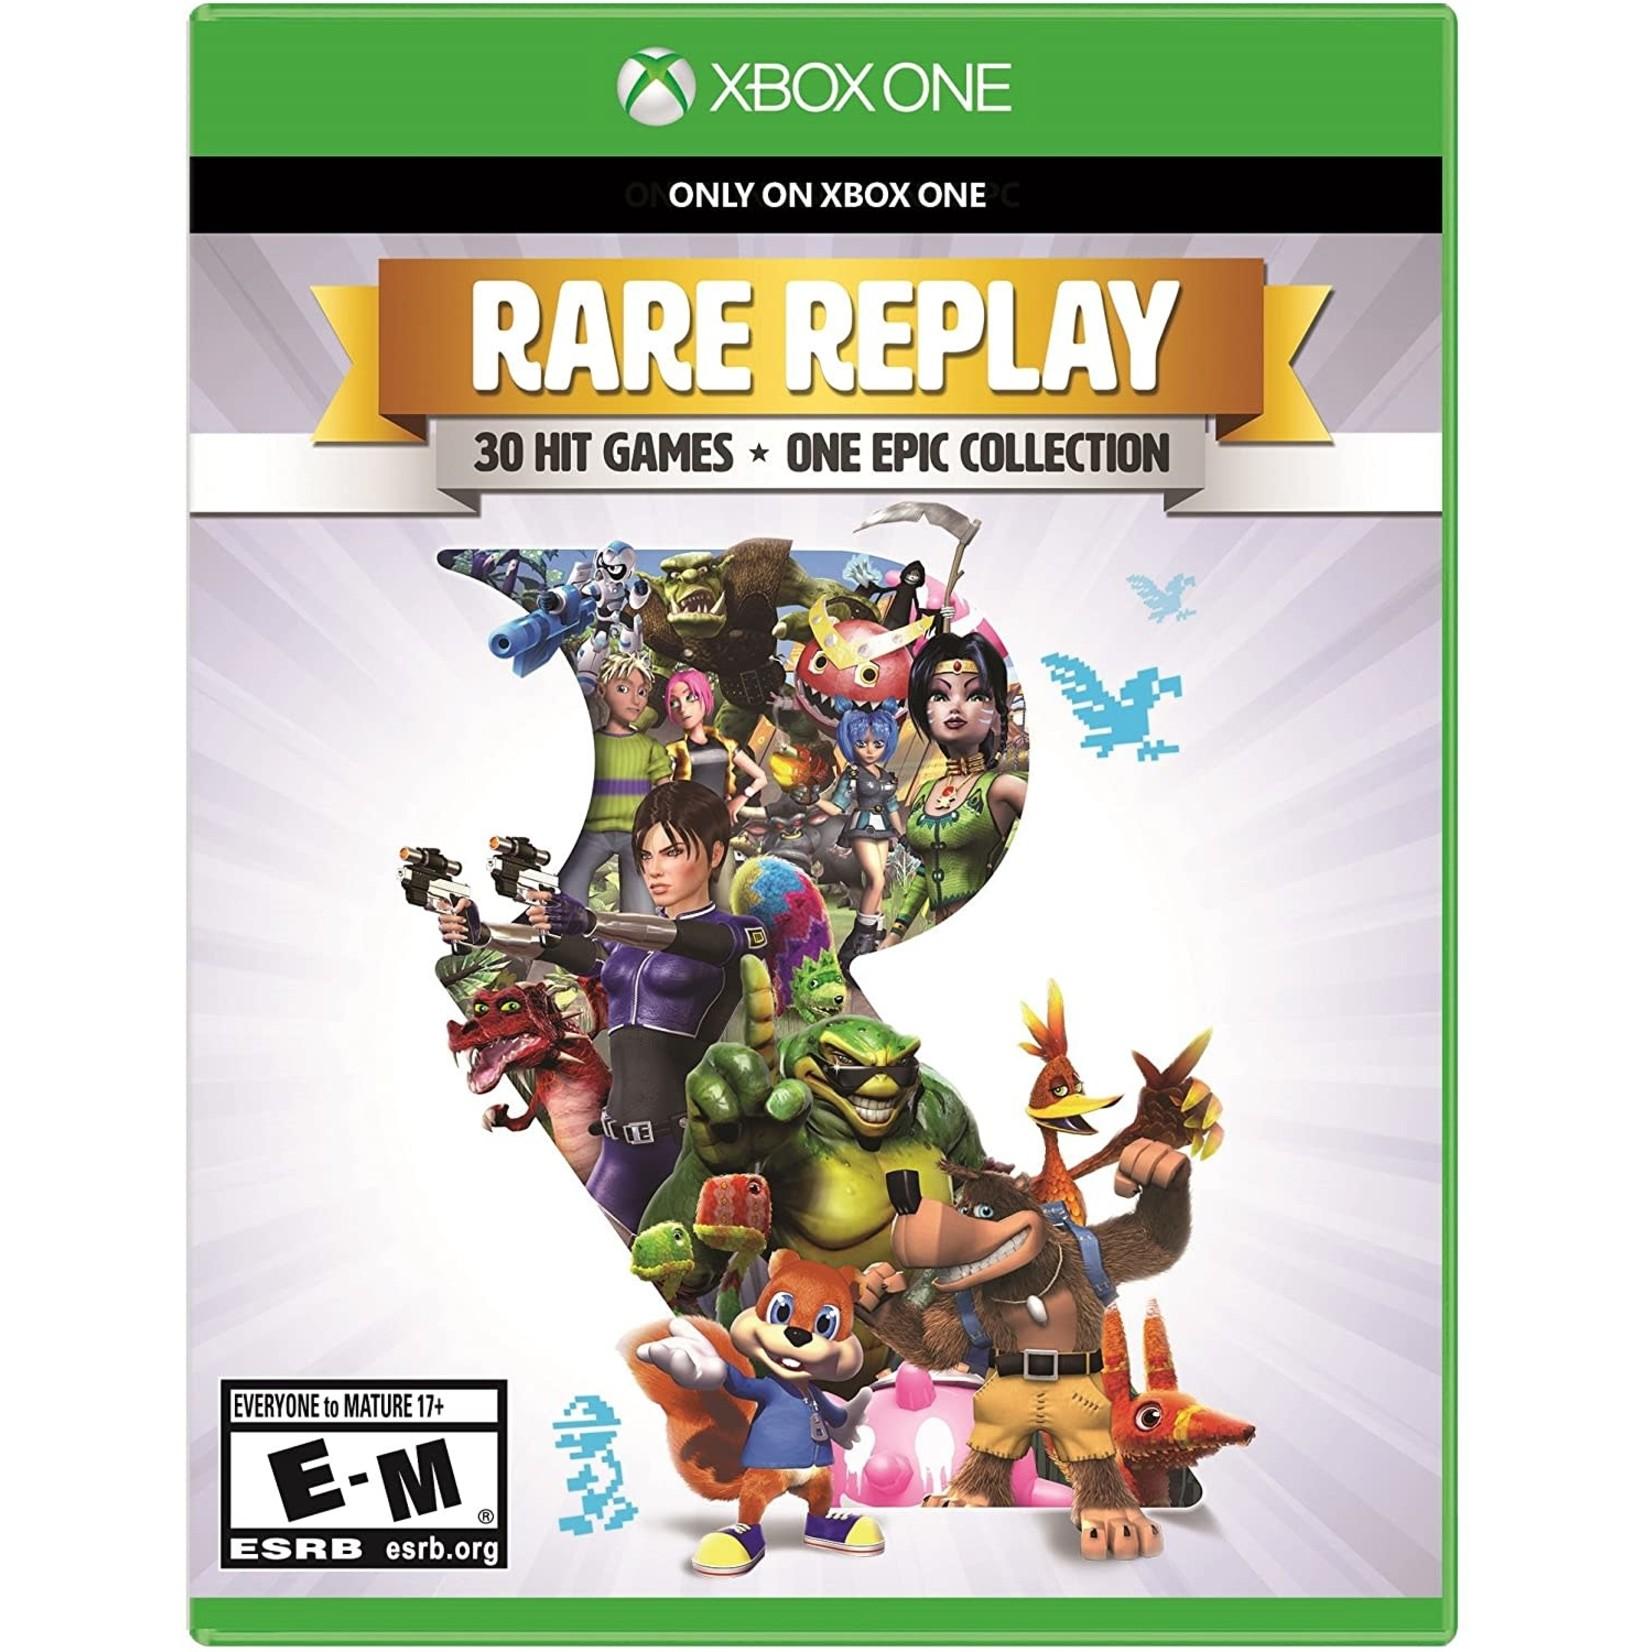 XB1-Rare Replay 30 hit games